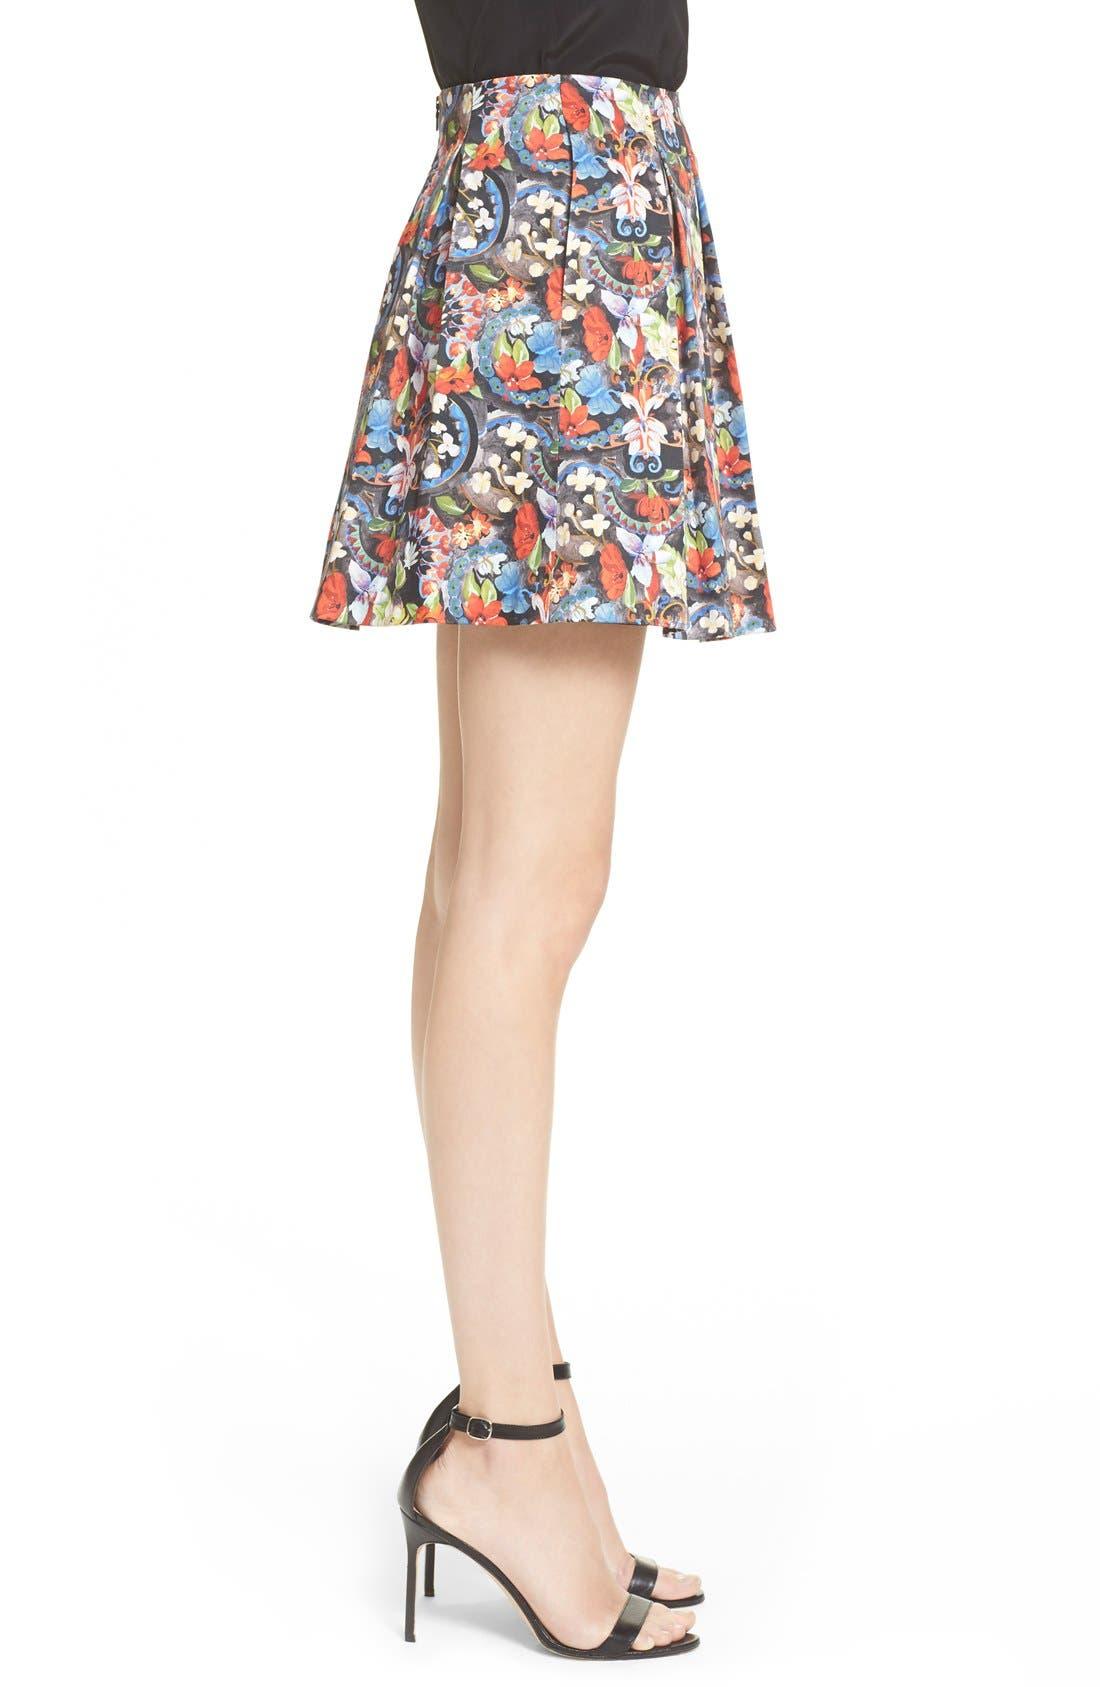 ALICE + OLIVIA, 'Parson' Floral Print Pleated Miniskirt, Alternate thumbnail 5, color, 605